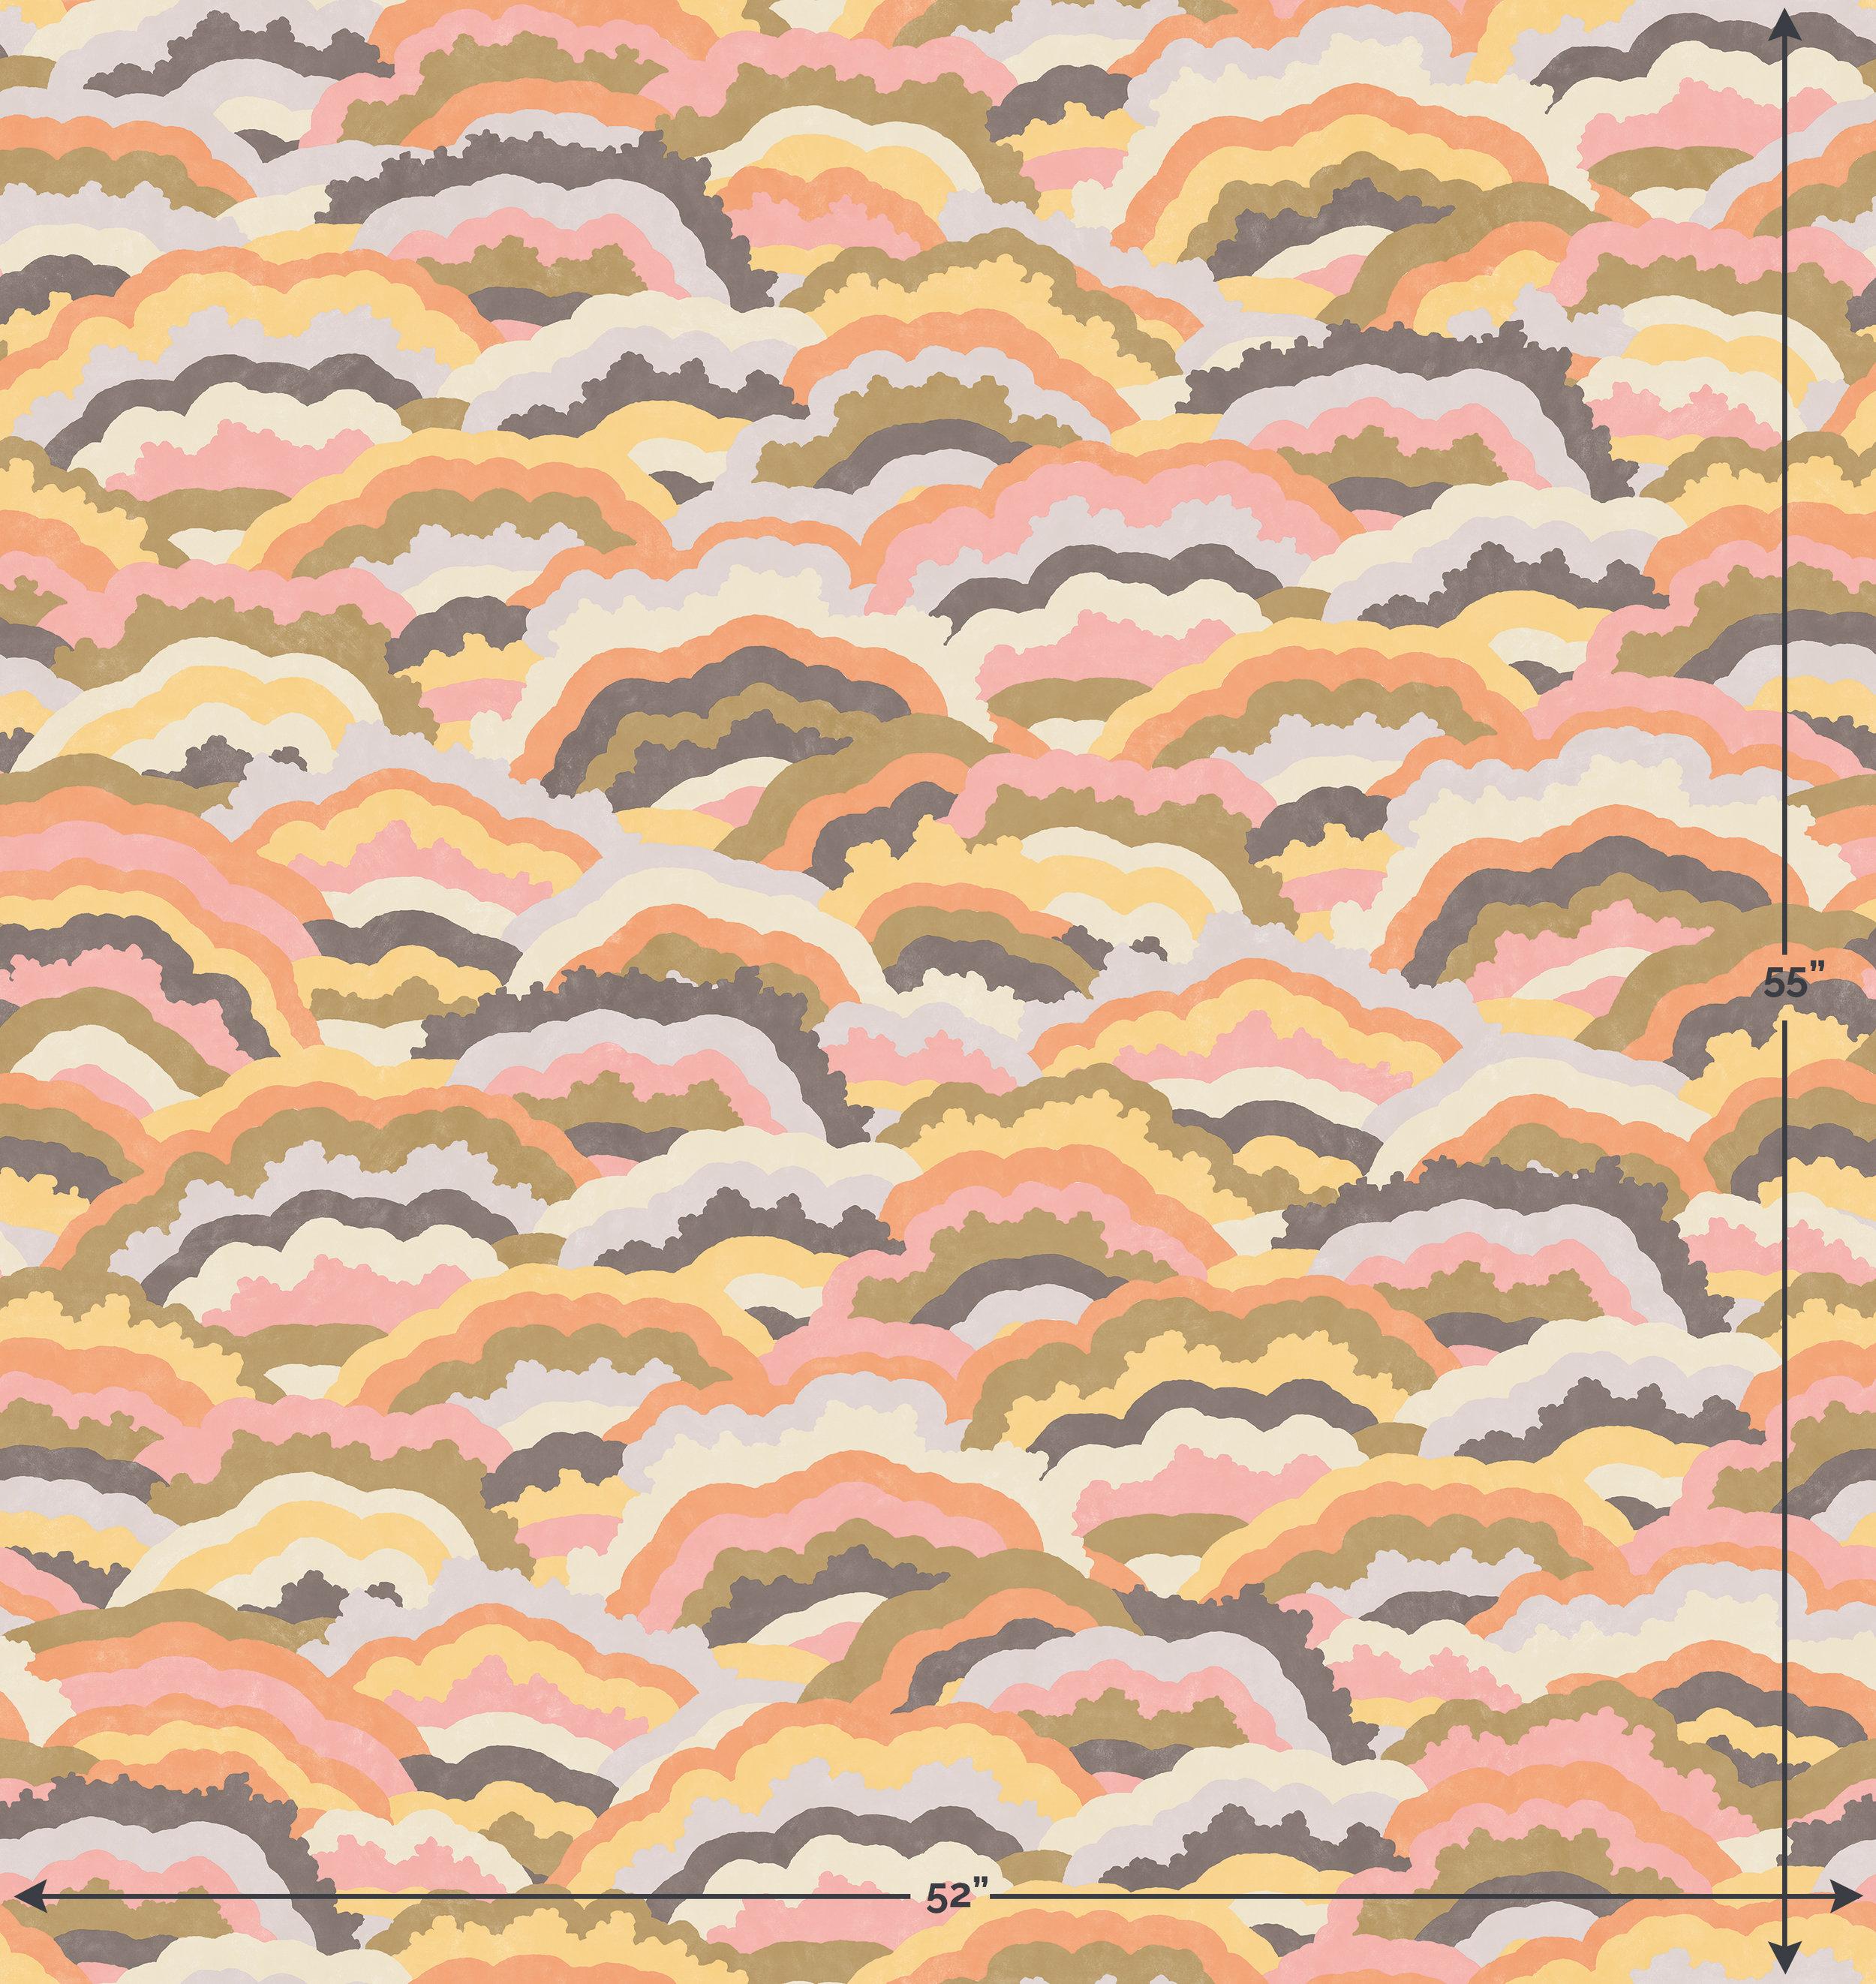 Dreamhouse_Colorway8_SML_WEB.jpg